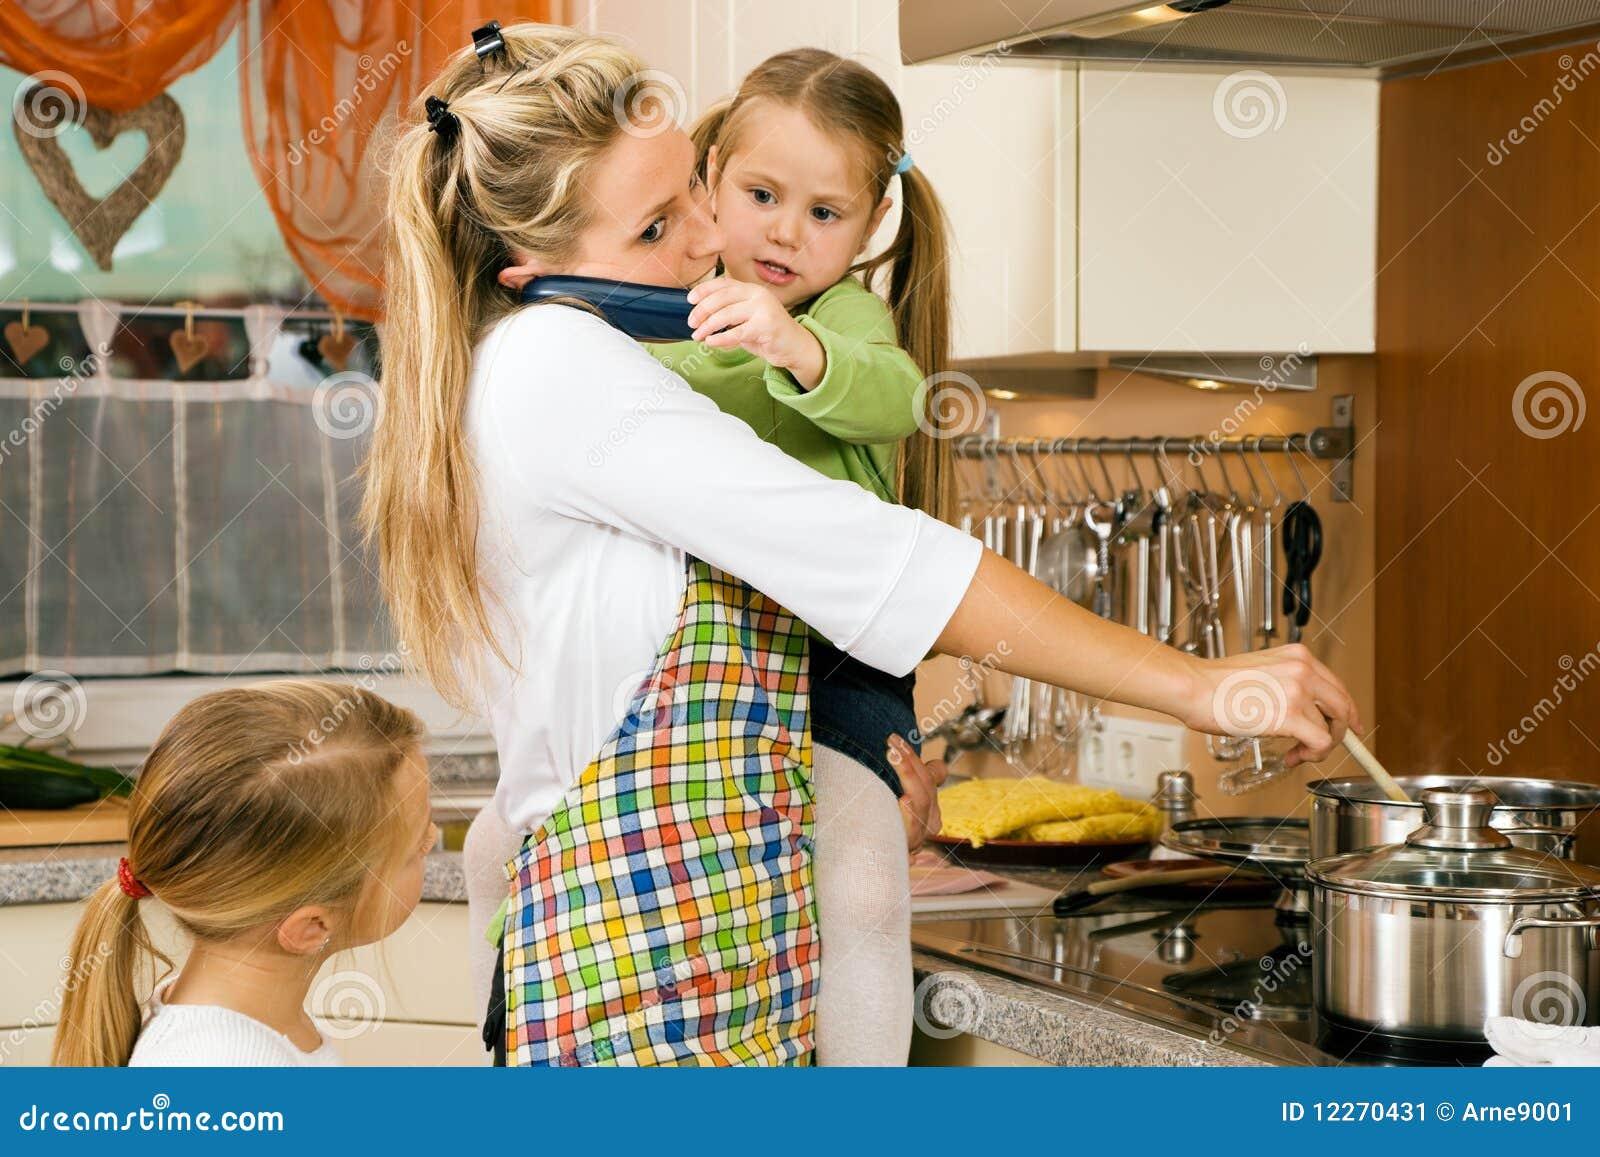 Femme au foyer et enfants ayant la tension image stock for Femme au foyer 1950